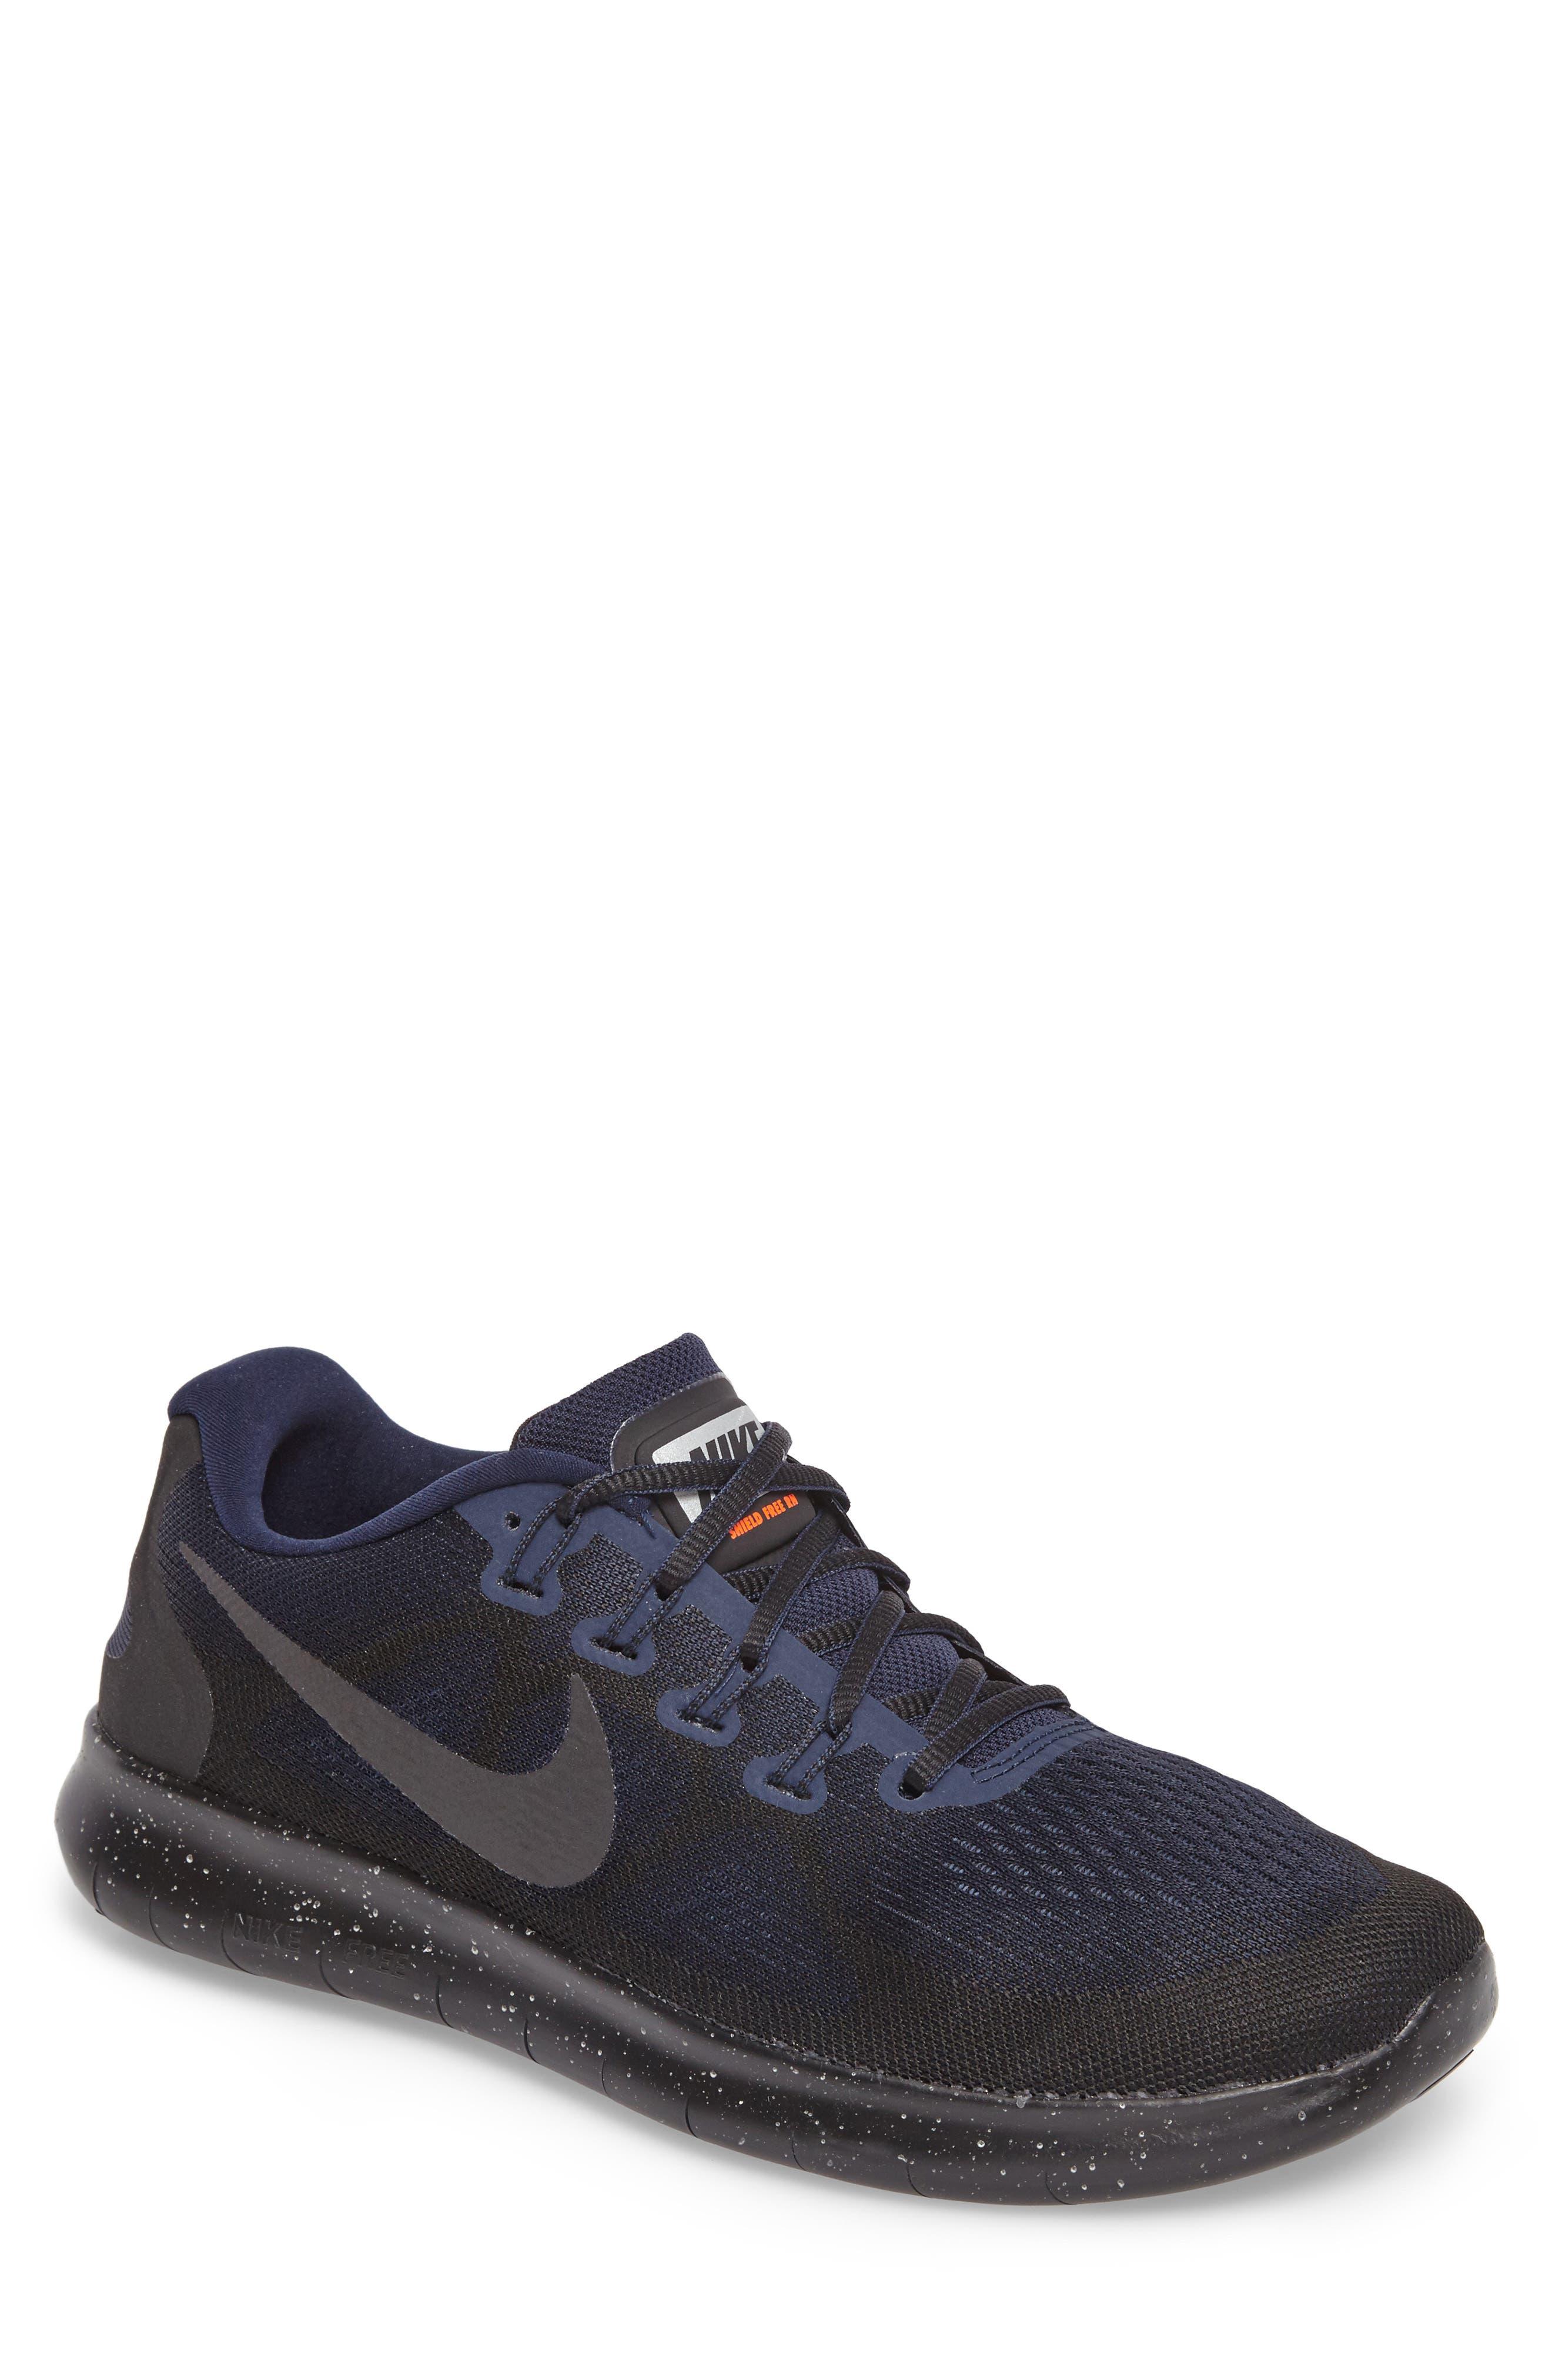 Main Image - Nike Free RN 2017 Shield Water-Repellent Training Shoe (Men)